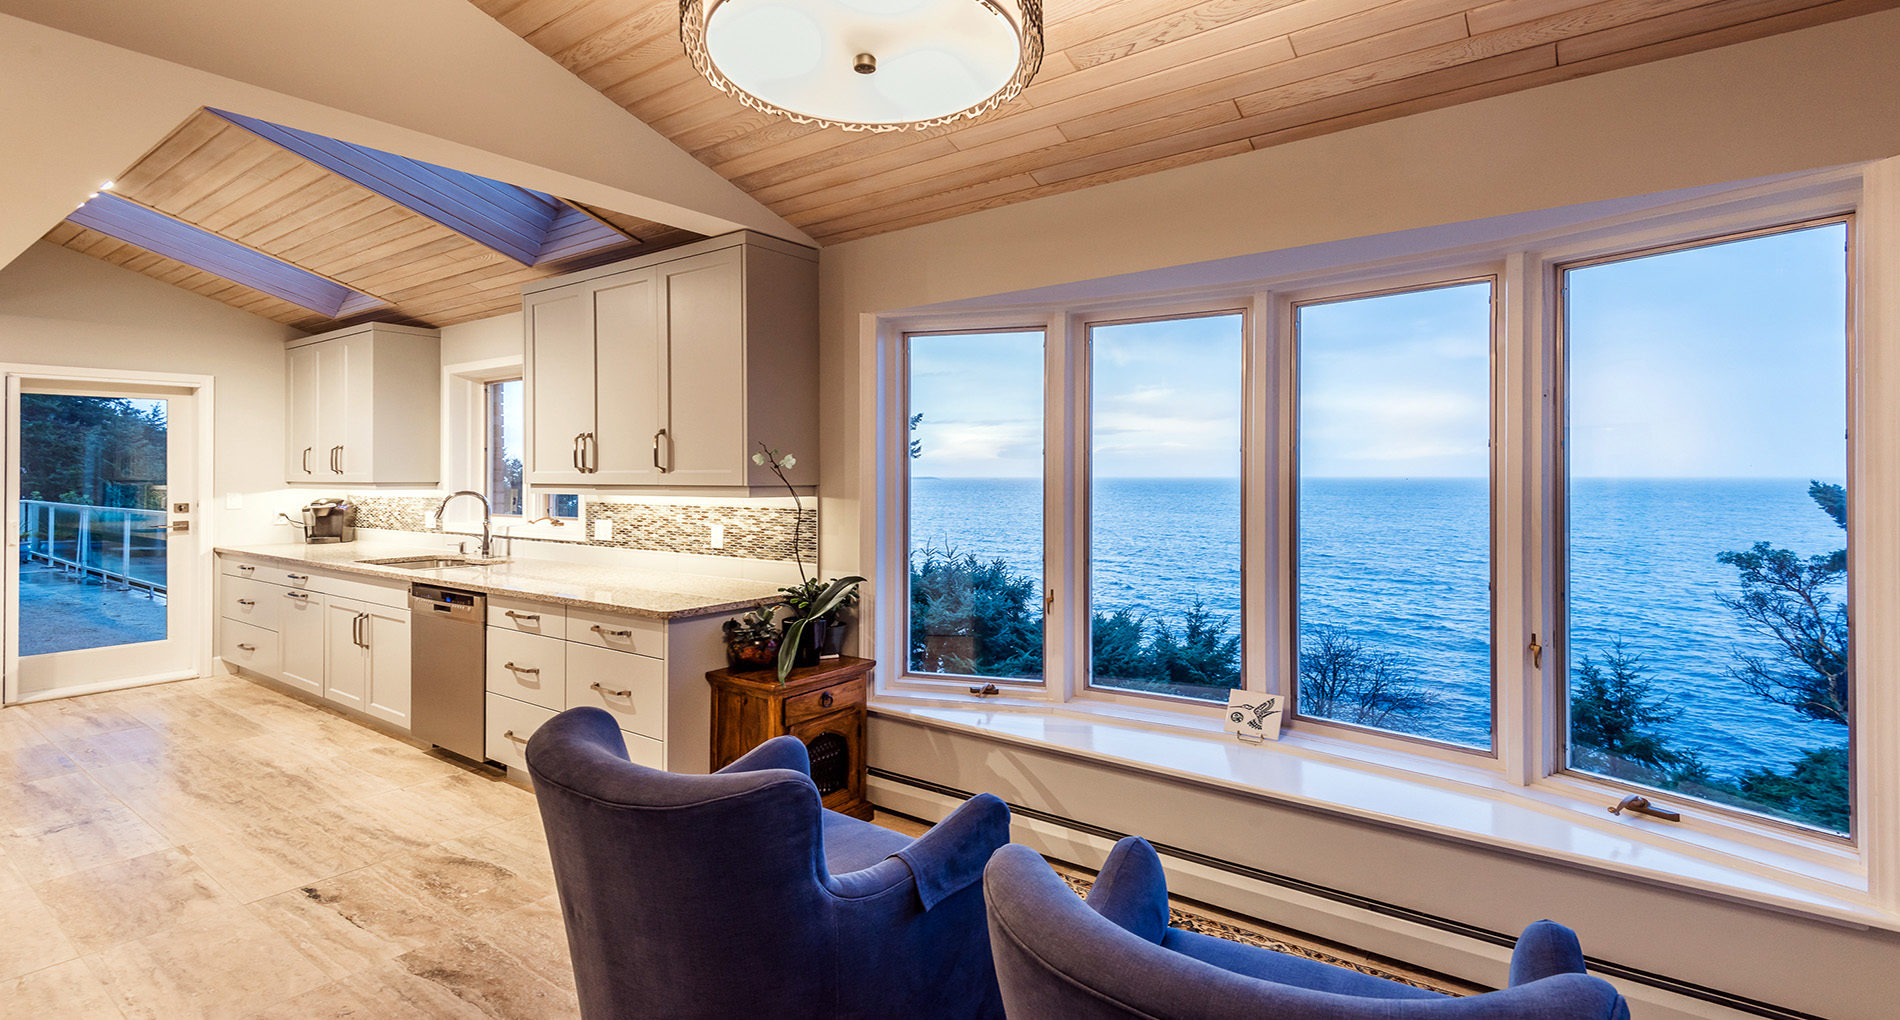 Home Renovation North Island Remora3716 Slider2